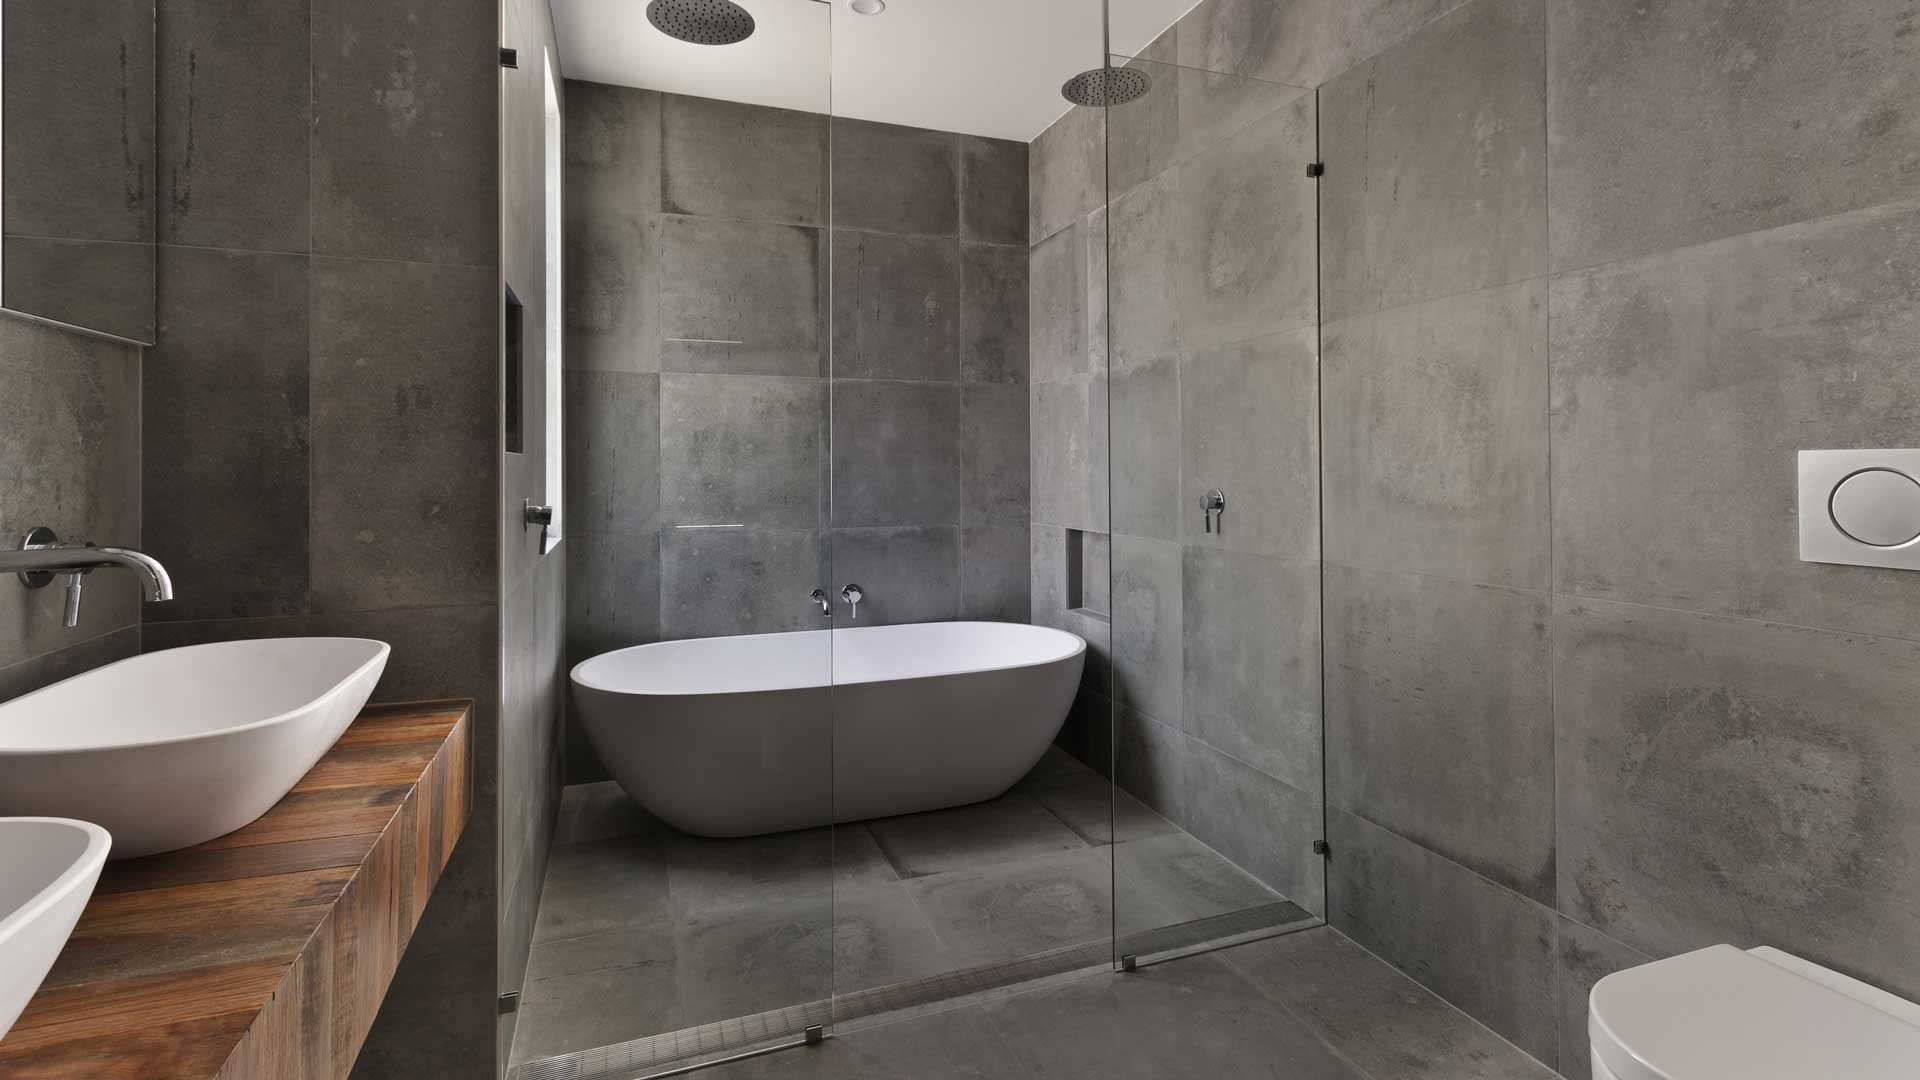 Tile catalogue why not tiles brisbane sunshine coast for Bathroom design catalogue